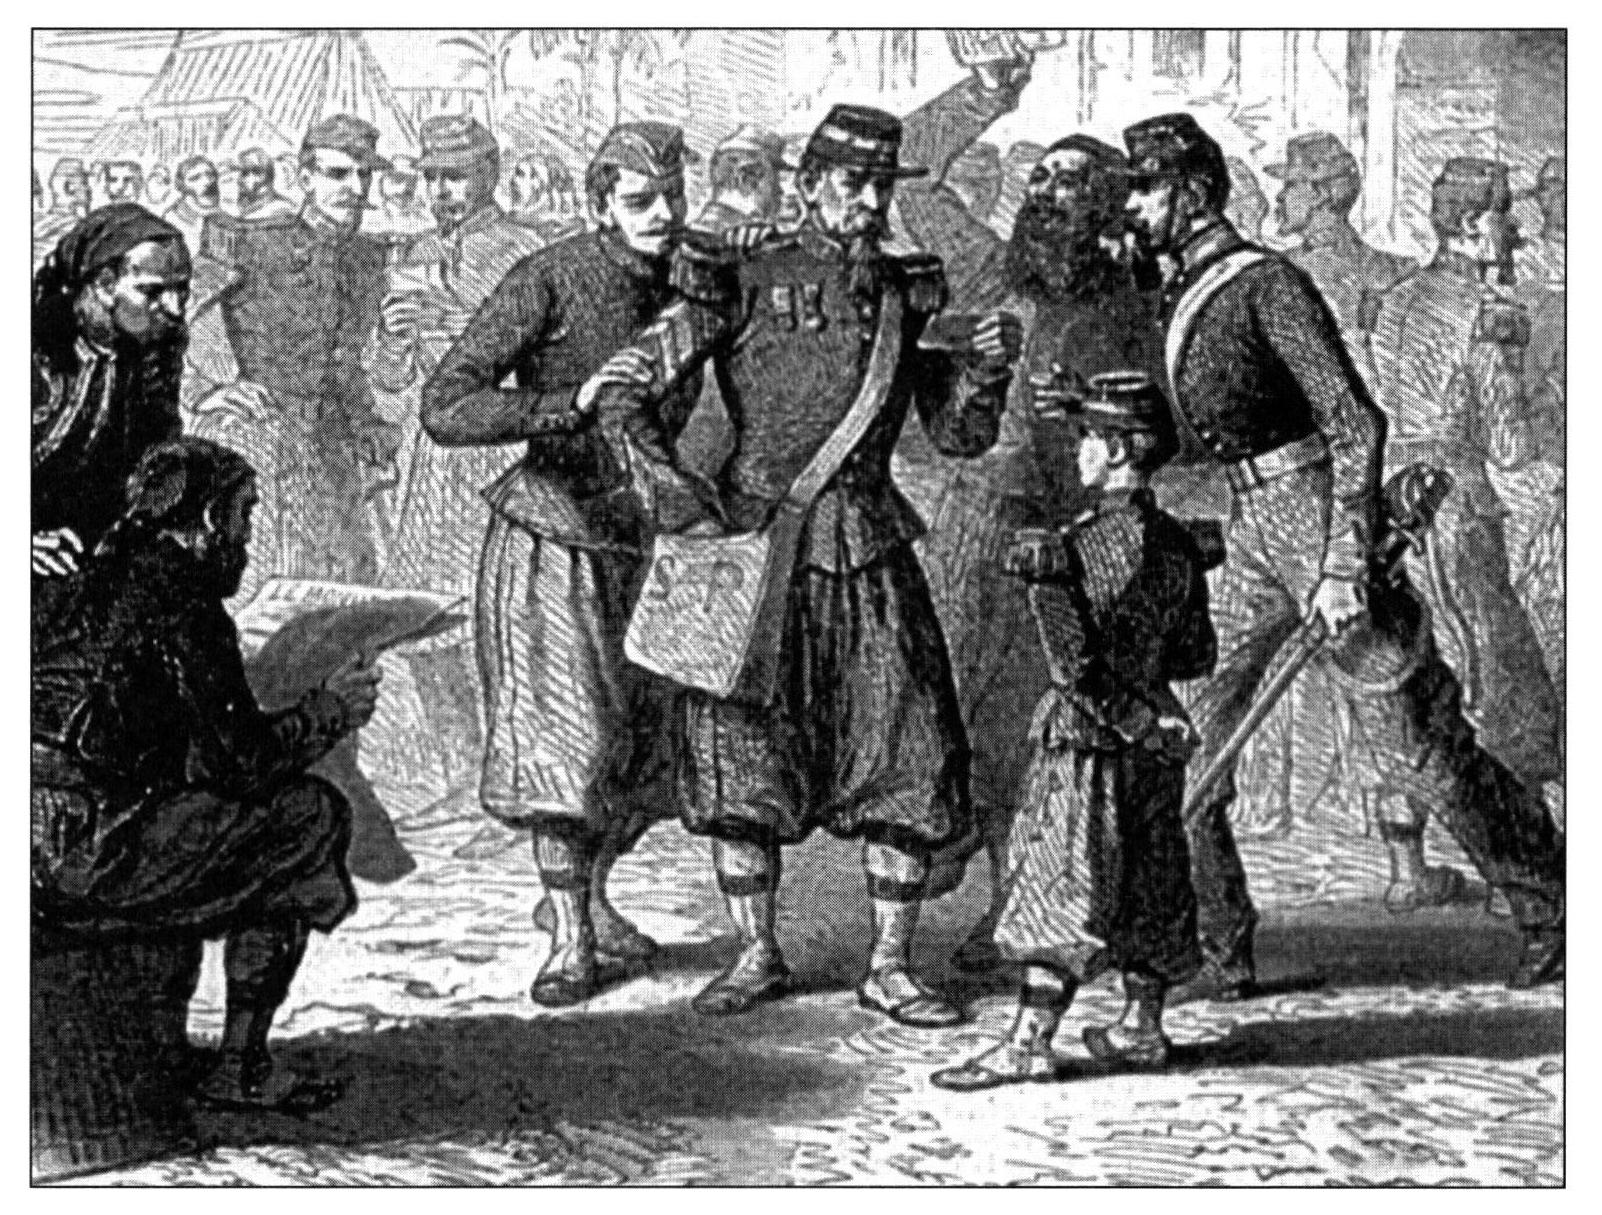 af9dc2a118a5 México Francia - México en un espejo  testimonio de los franceses de ...